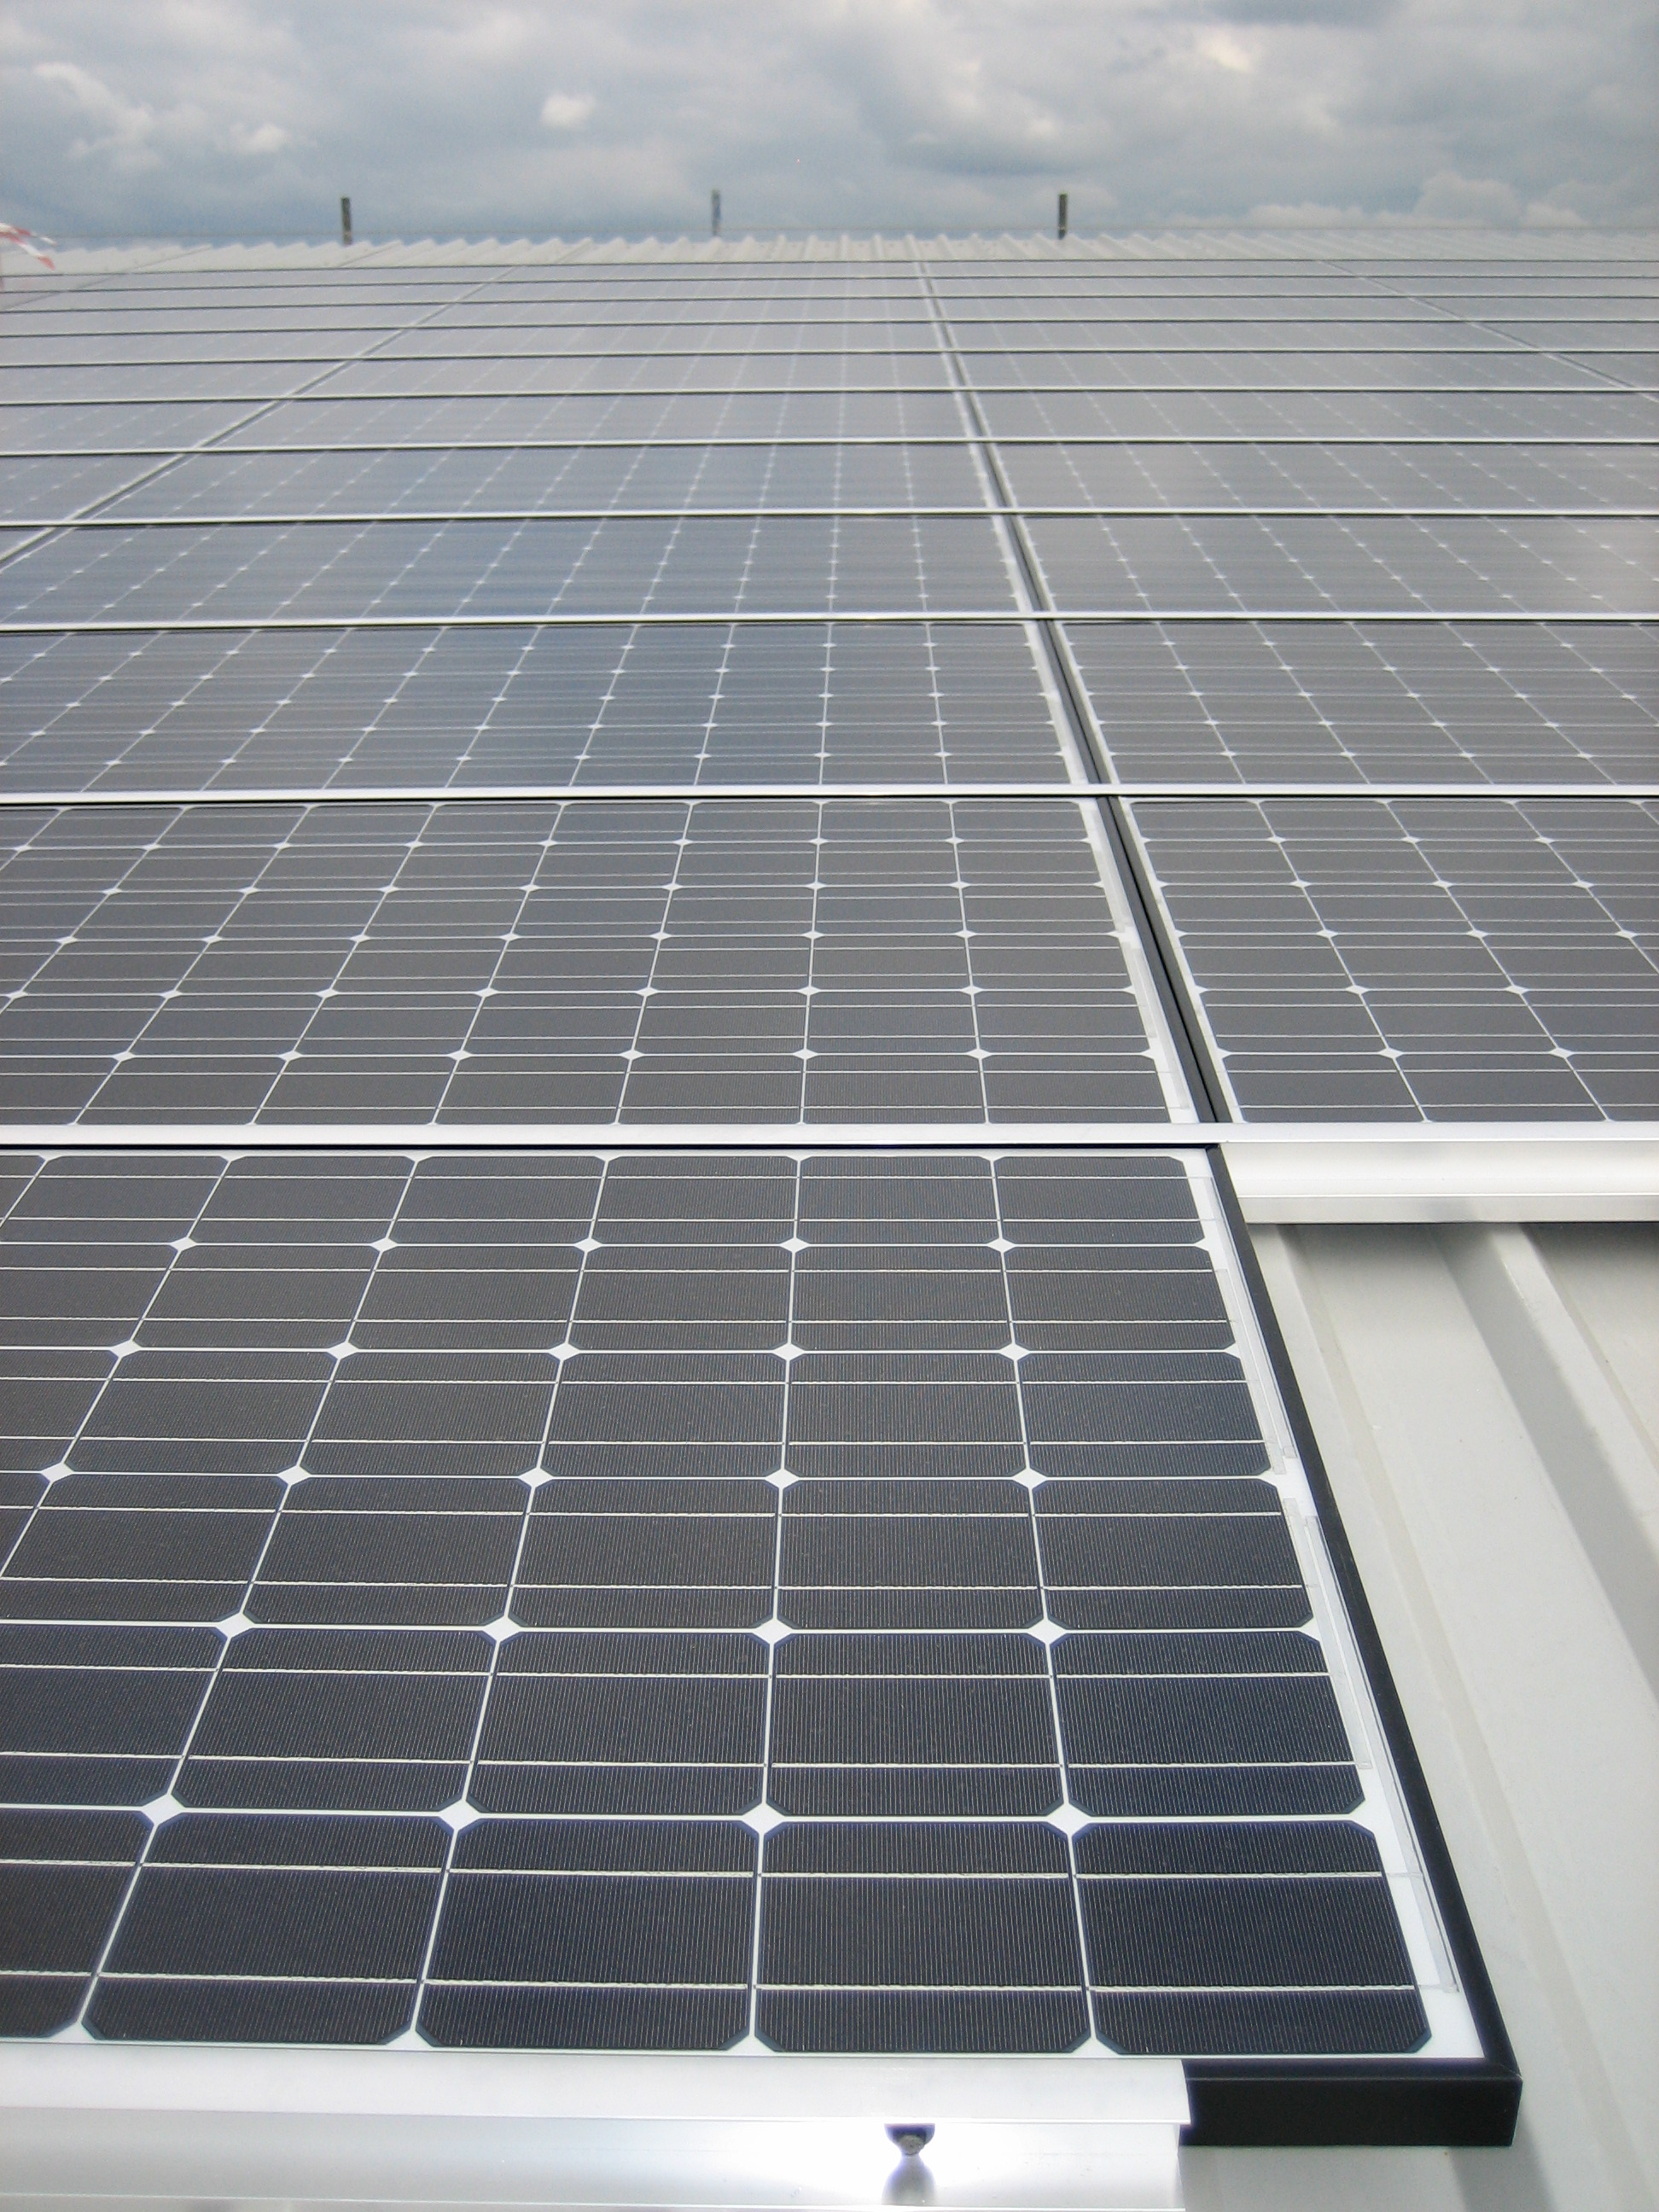 PV roof mounted array - Croydon.JPG